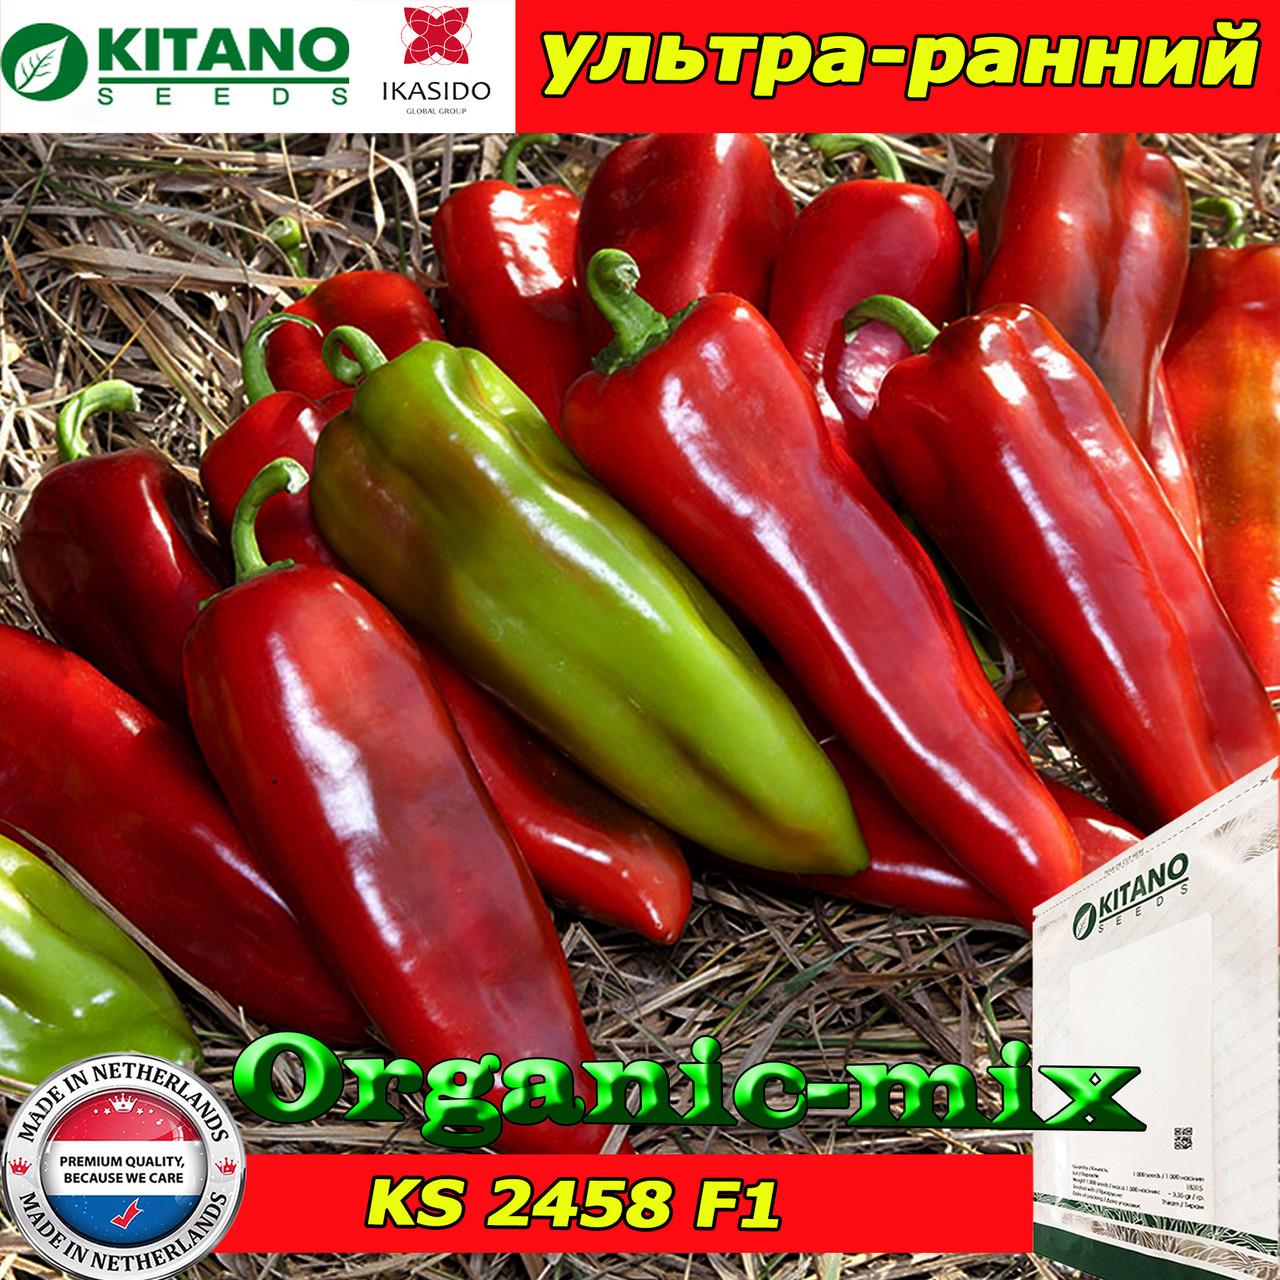 Капия KS 2458 F1, семена сладкого перца, пакет 500 семян ТМ Kitano Seeds (Нидерланды)